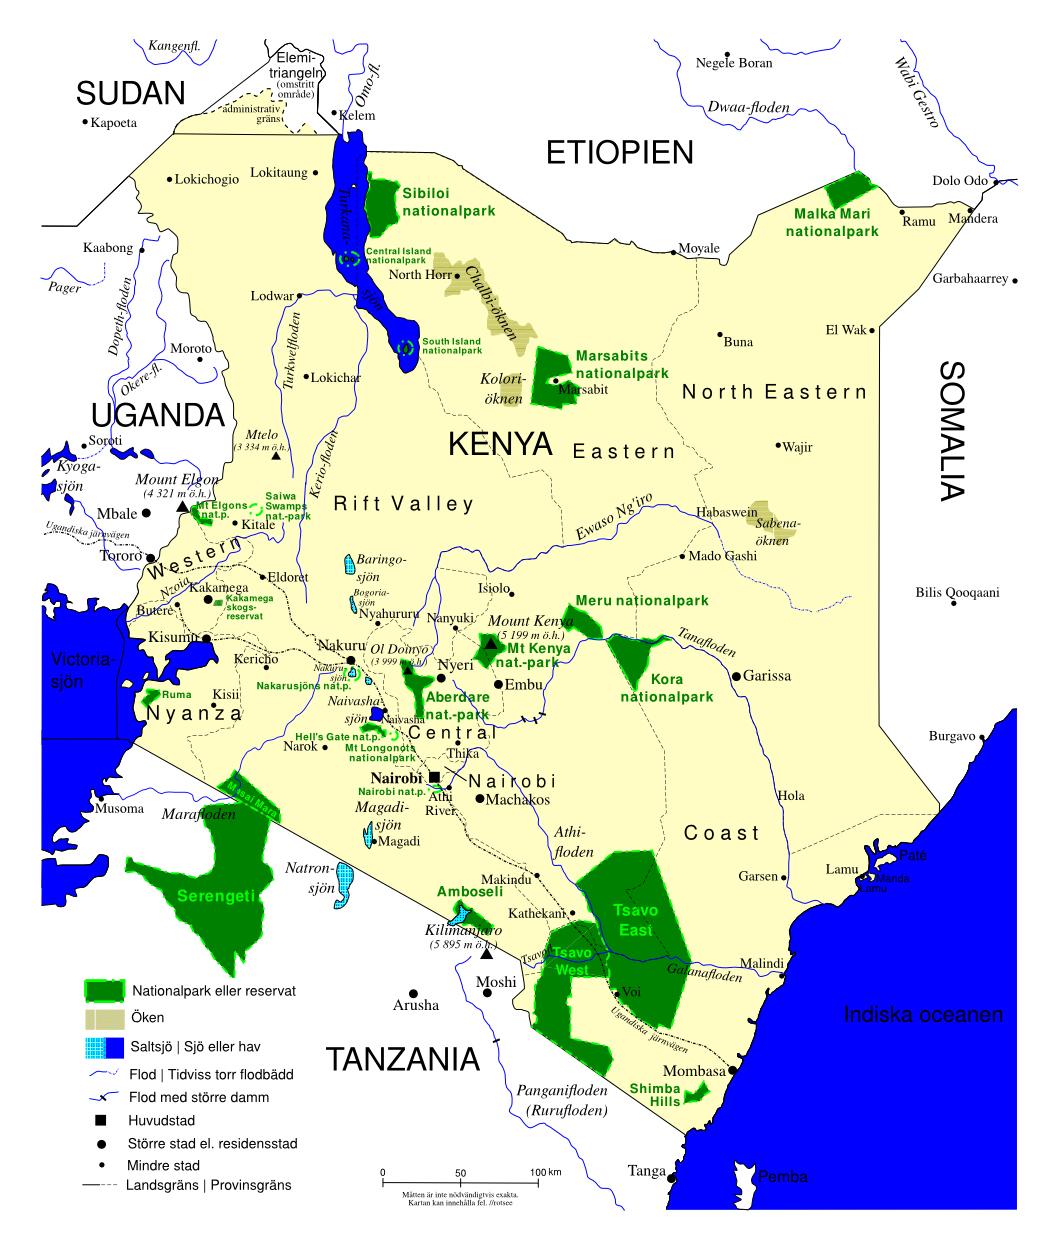 Detailed national parks map of Kenya. Kenya detailed national parks ...